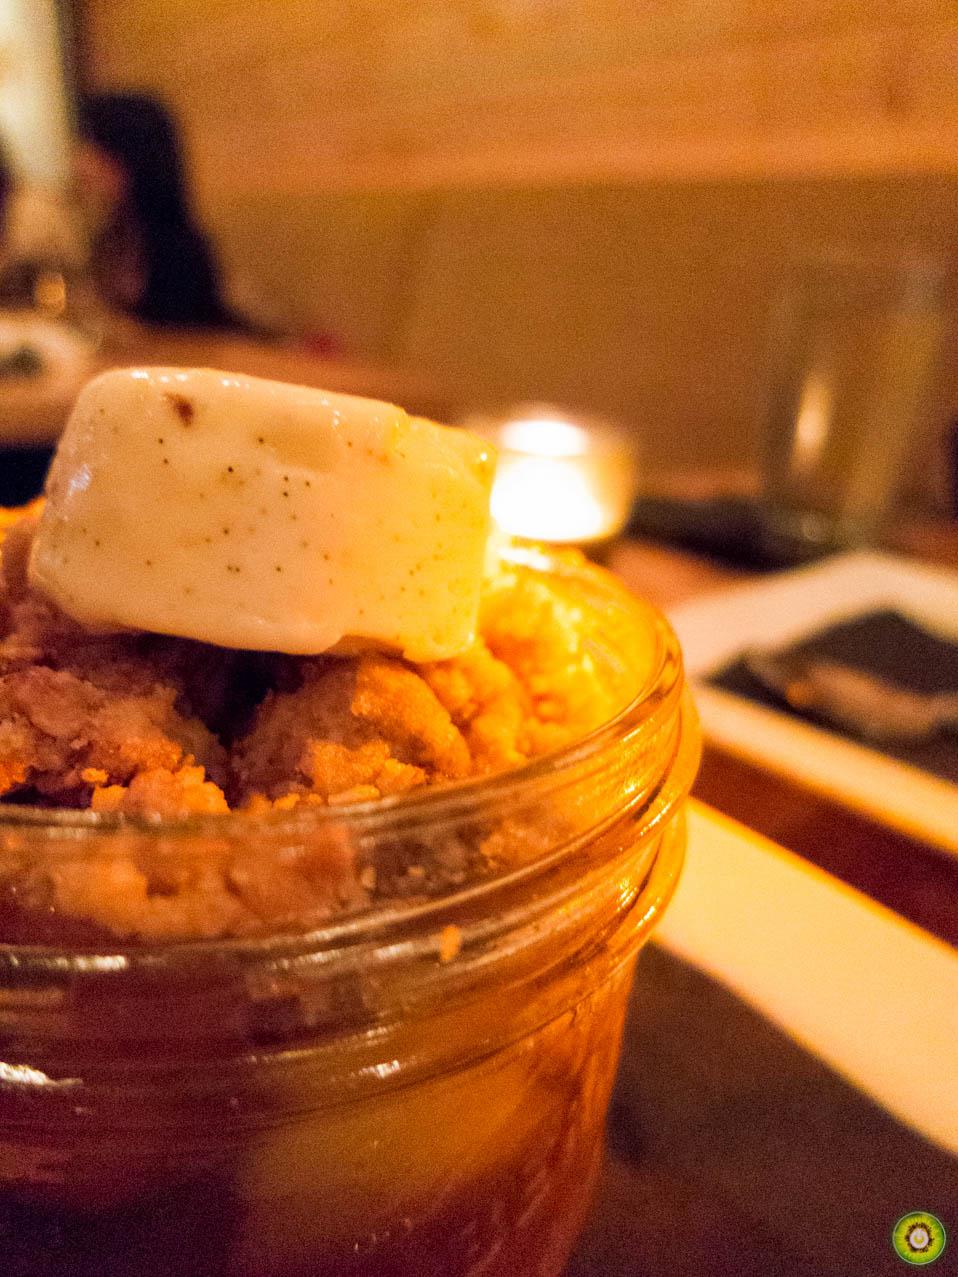 Apple Crumple w/ gala and granny smith, crumble, vanilla bavarian